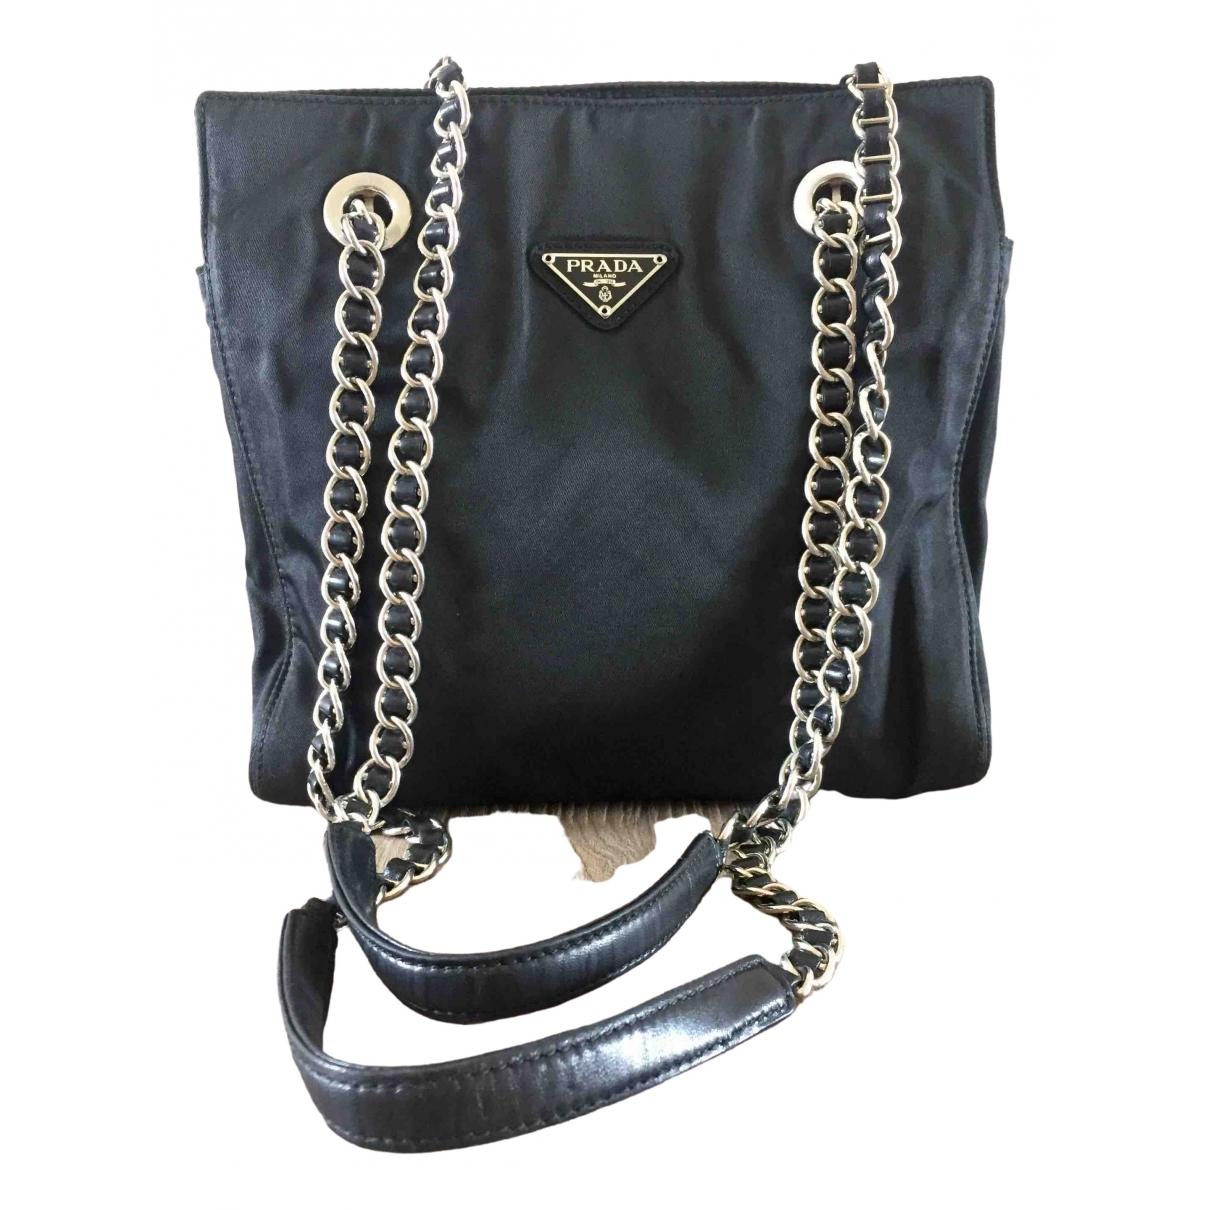 Prada Tessuto Metallo  Handtasche in  Schwarz Synthetik